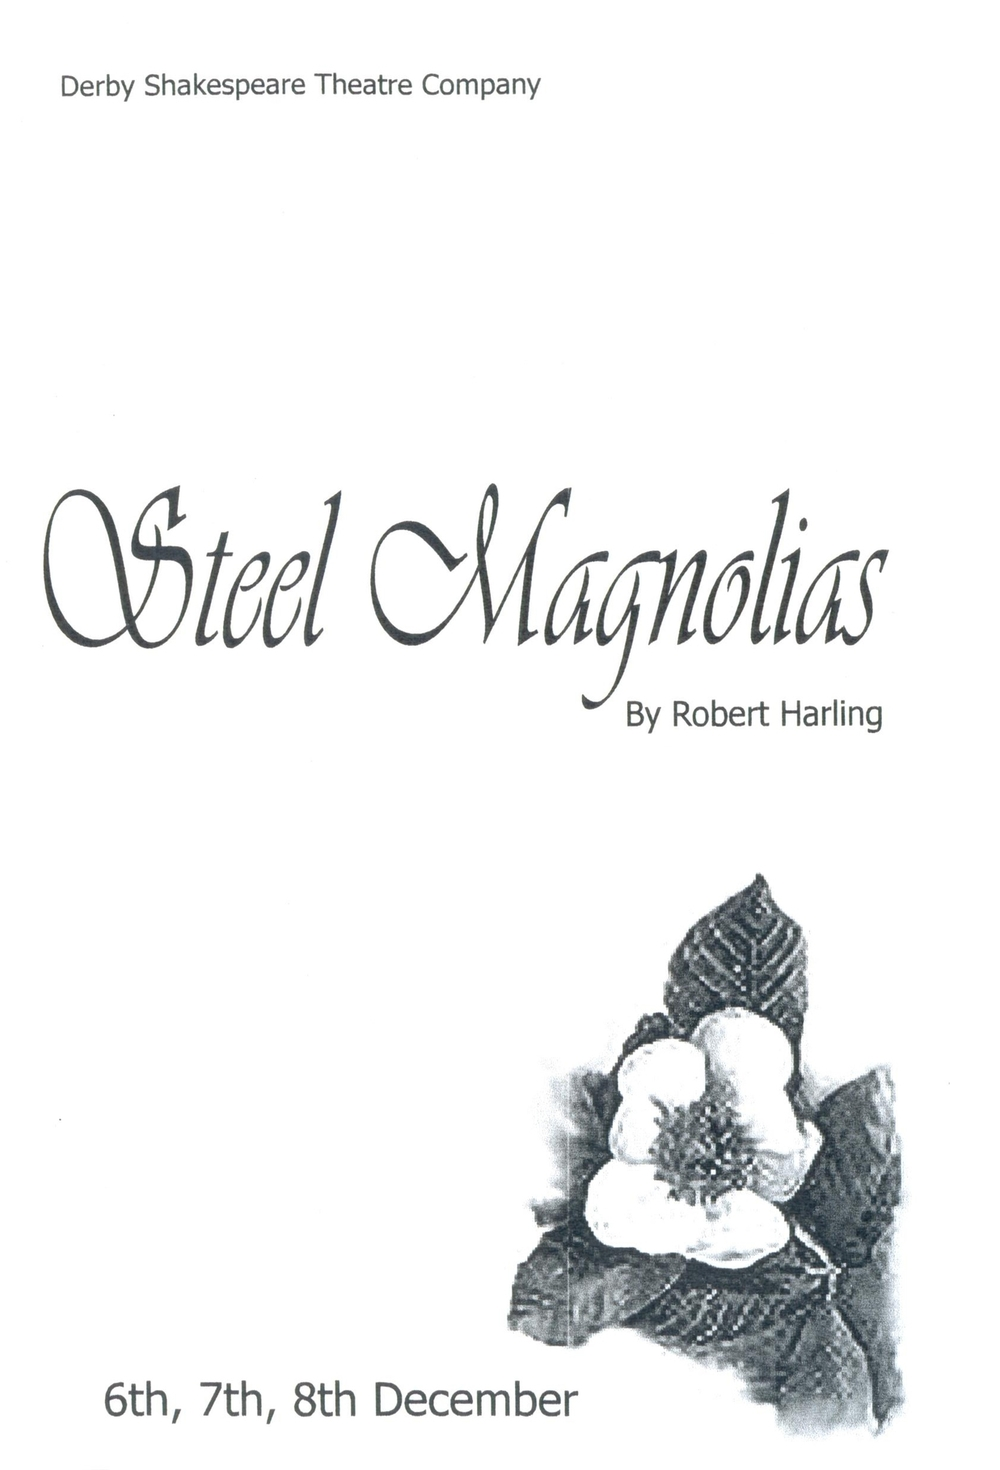 'Steel Magnolias' 2006